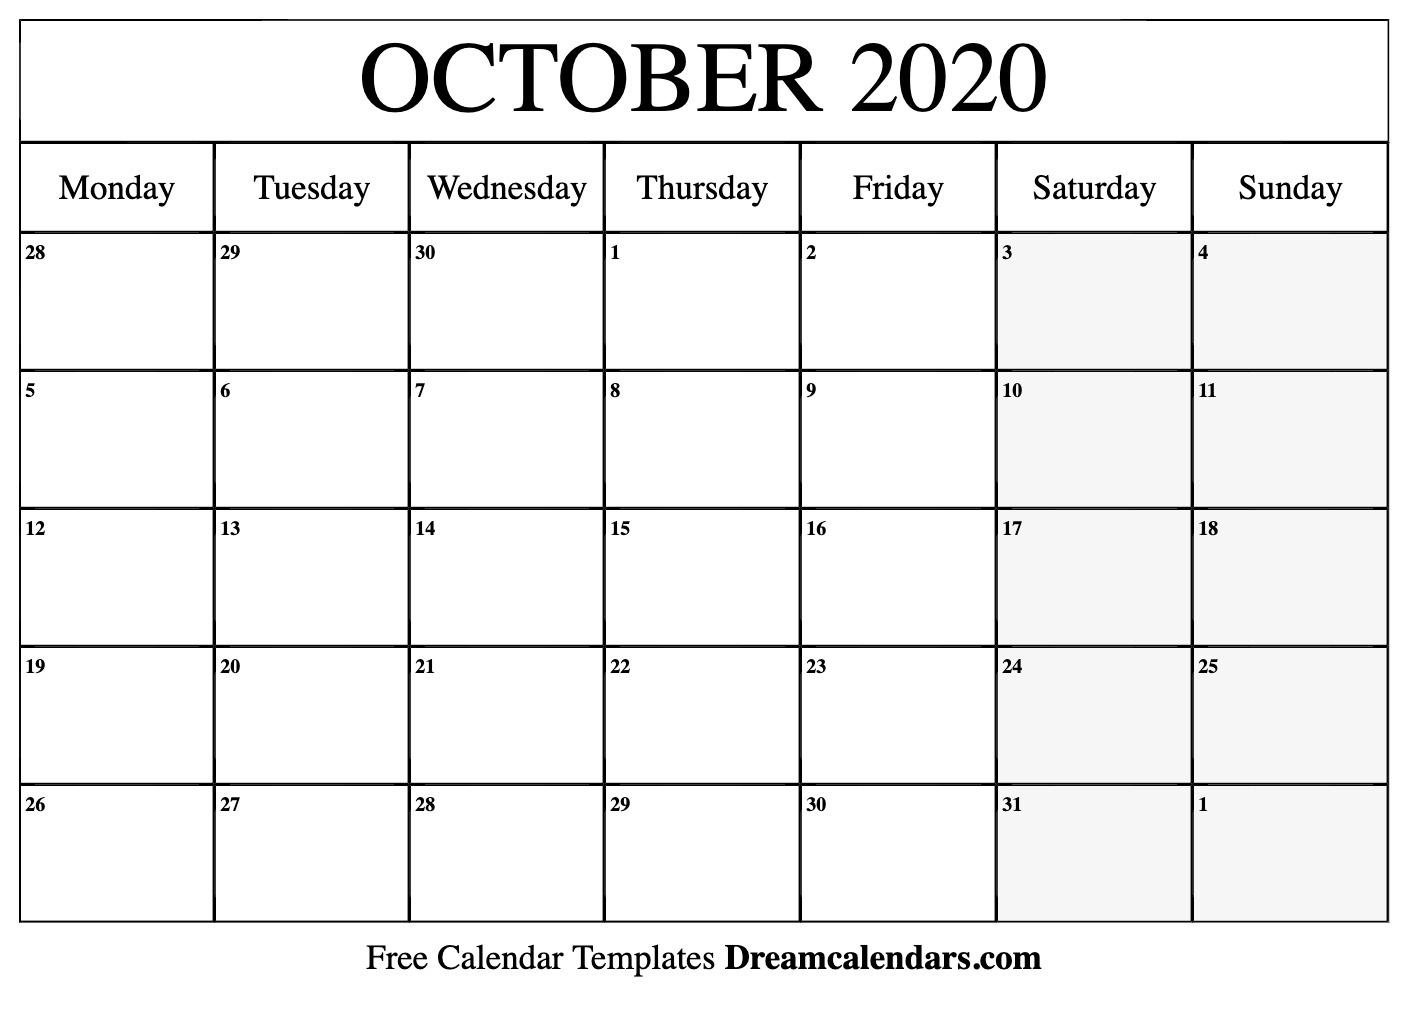 Printable October 2020 Calendar_Blank Calendar October 2020 Pdf